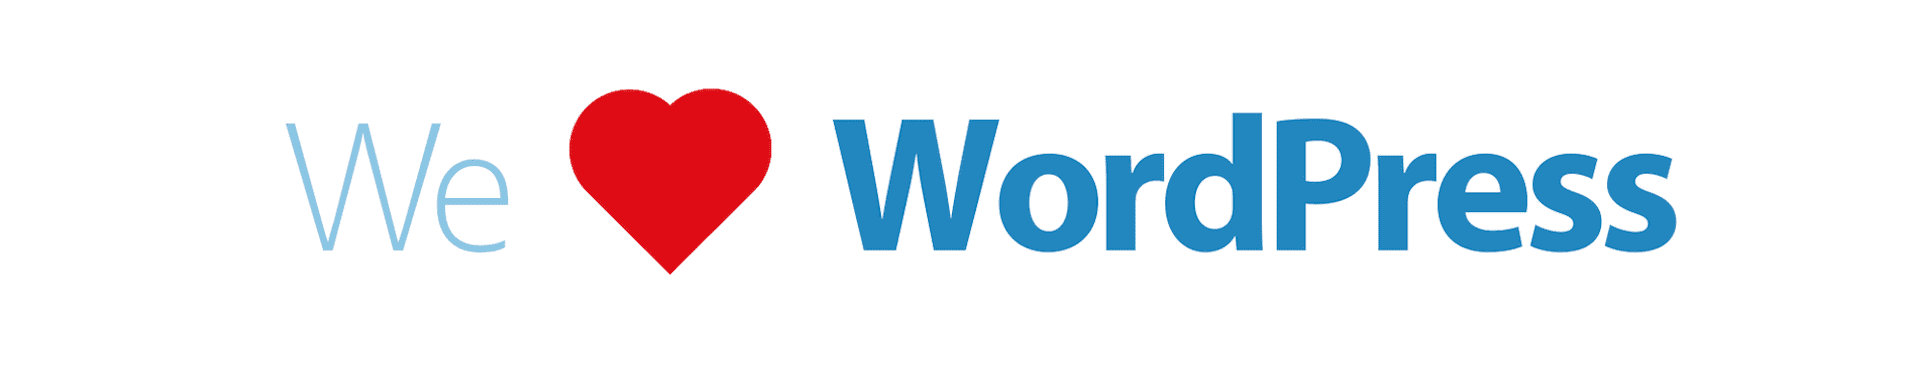 JRM Web Marketing Loves WordPress Website Designs